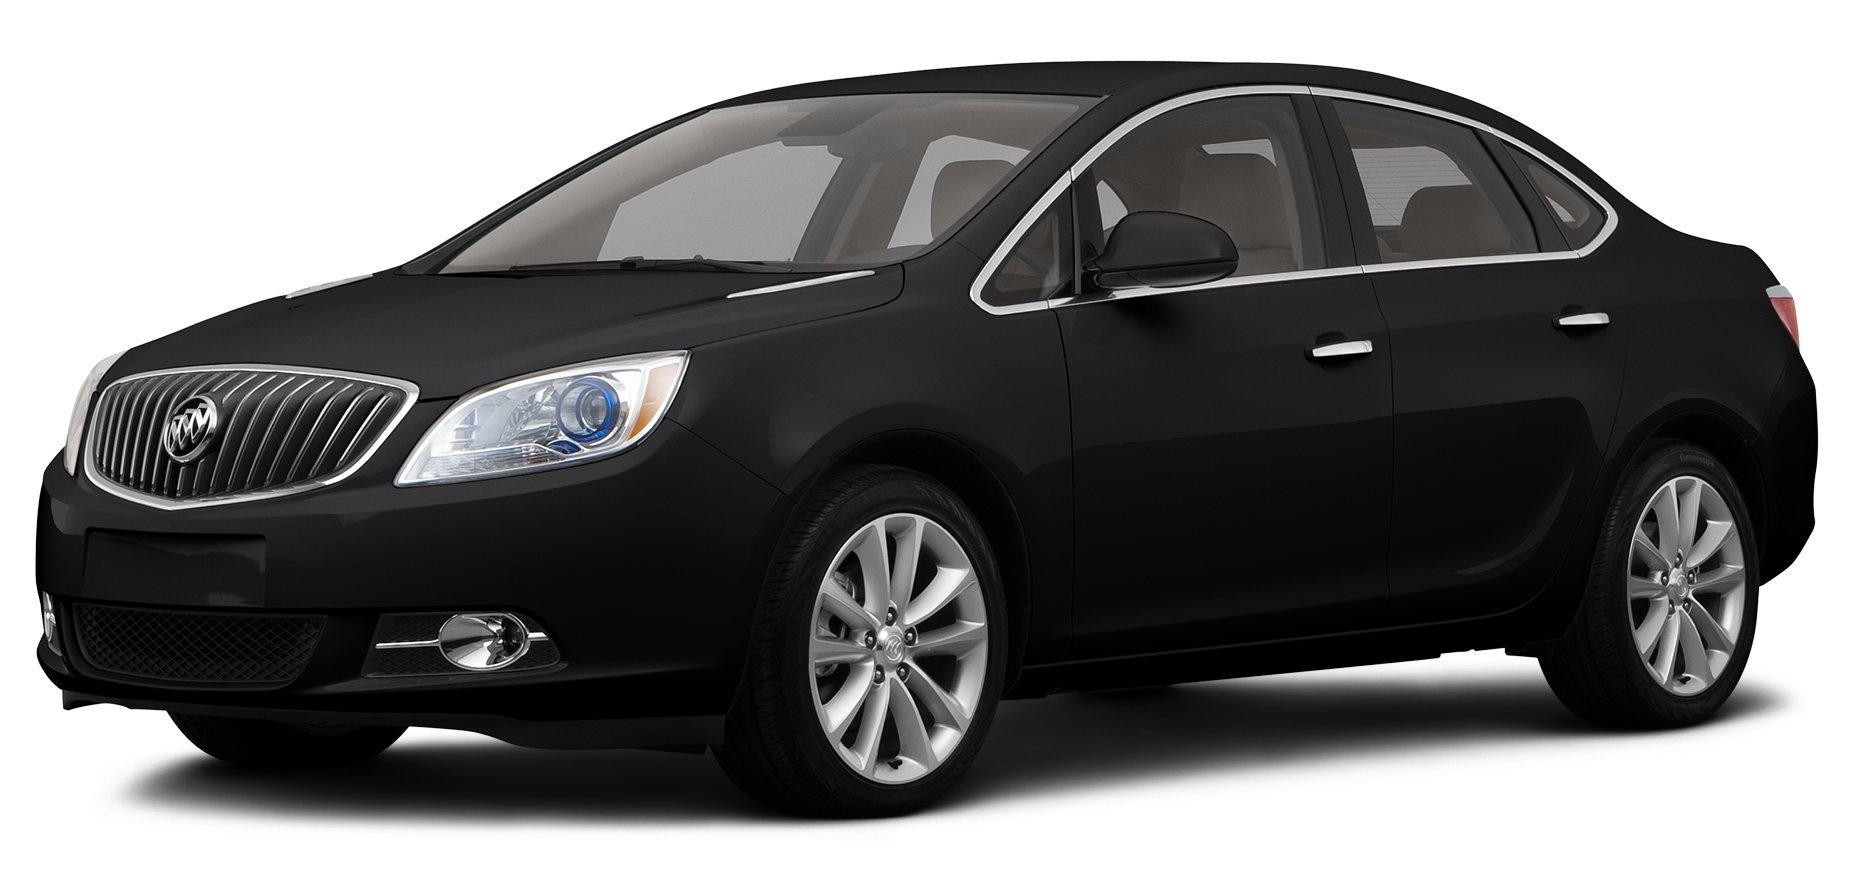 2013 Honda Civic Reviews Images And Specs Vehicles 2014 Buick Verano Fuse Box Convenience Group 4 Door Sedan